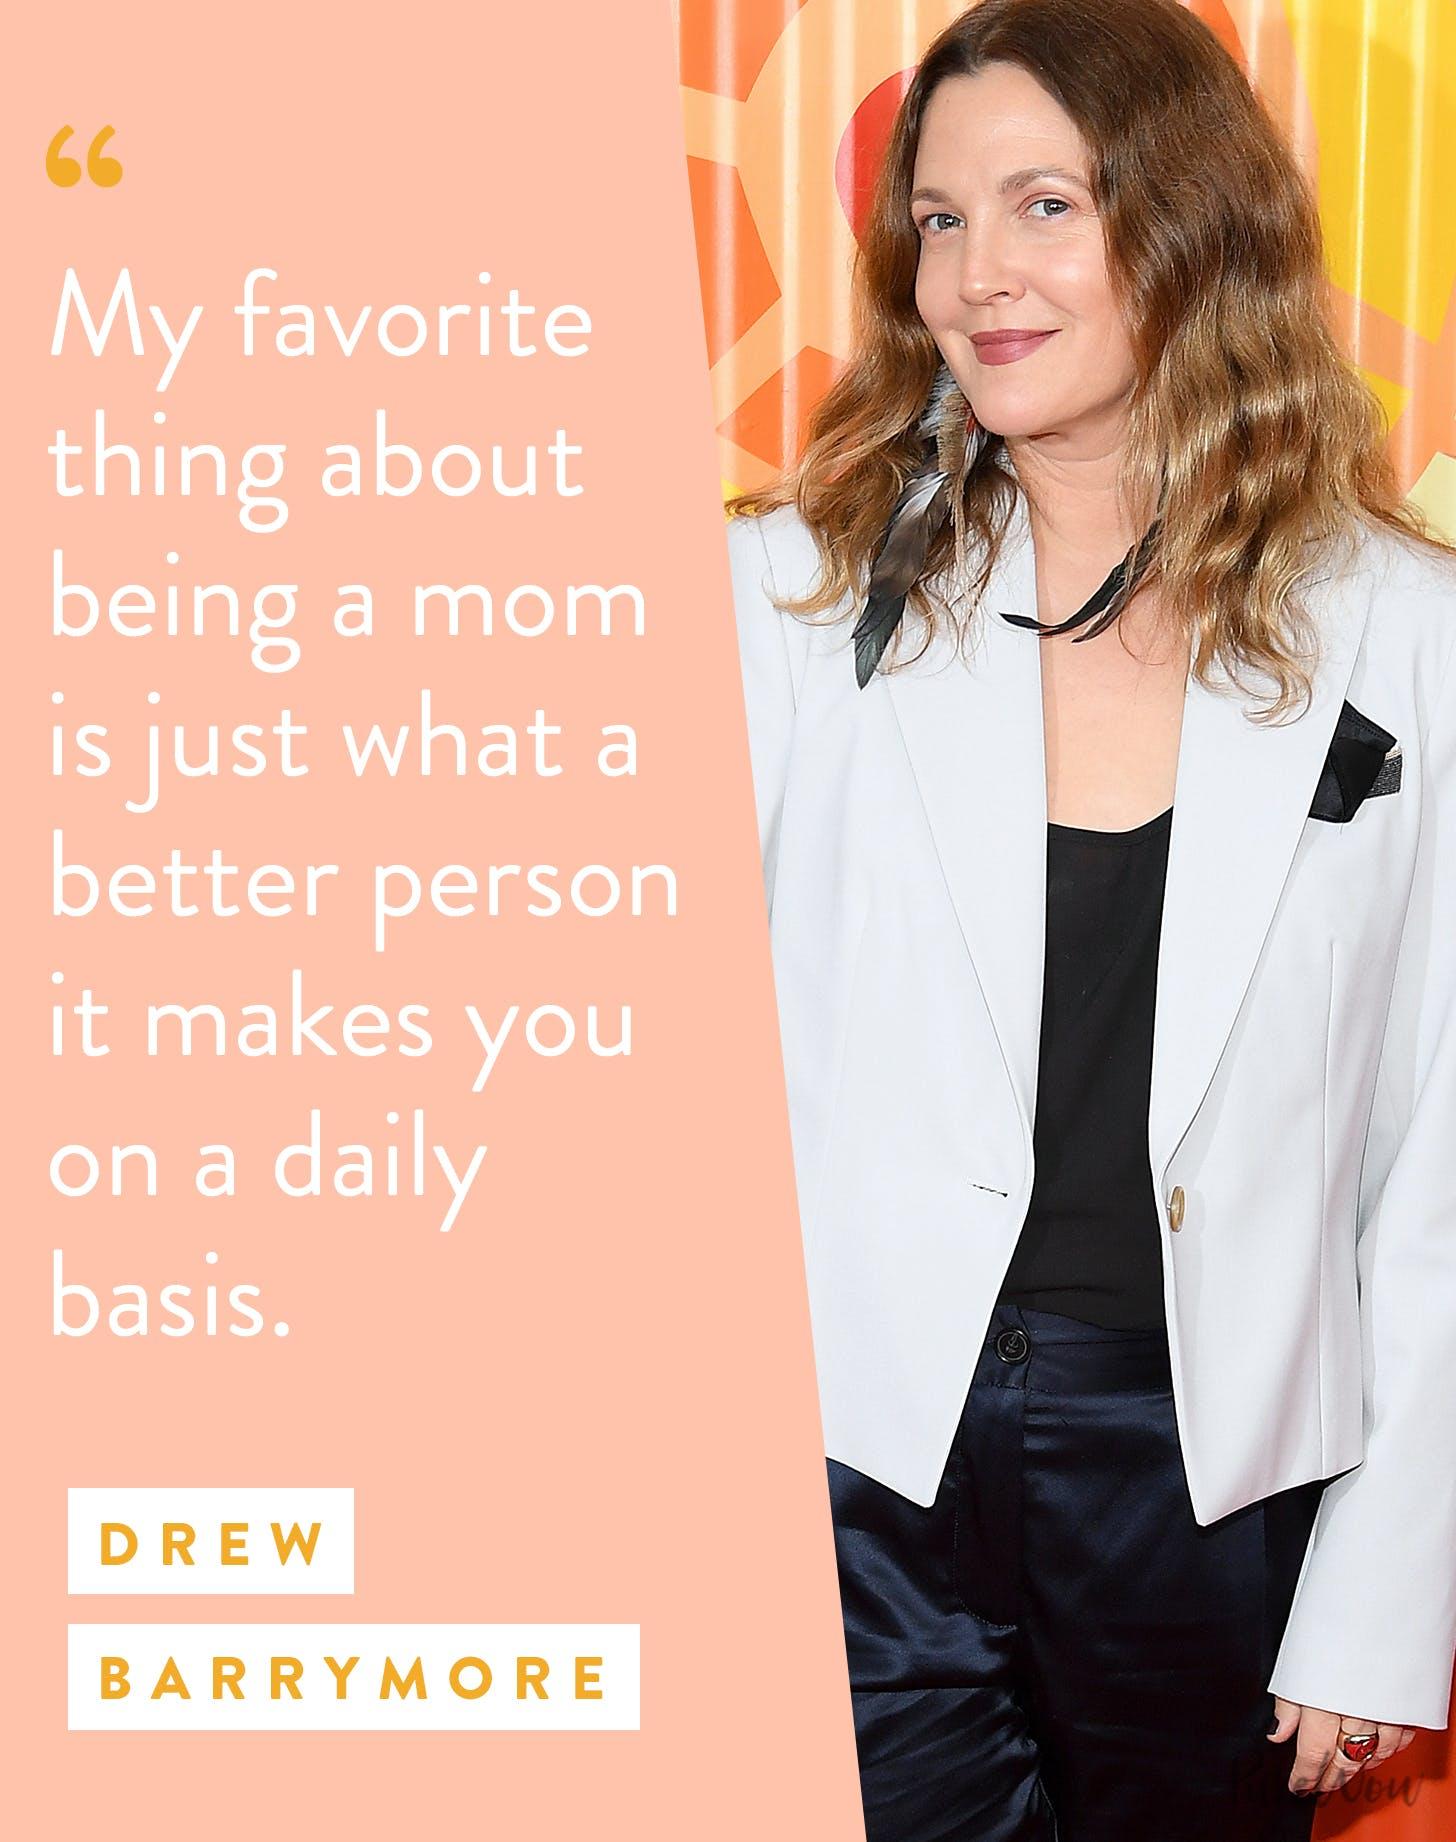 motherhood quotes drew barrymore